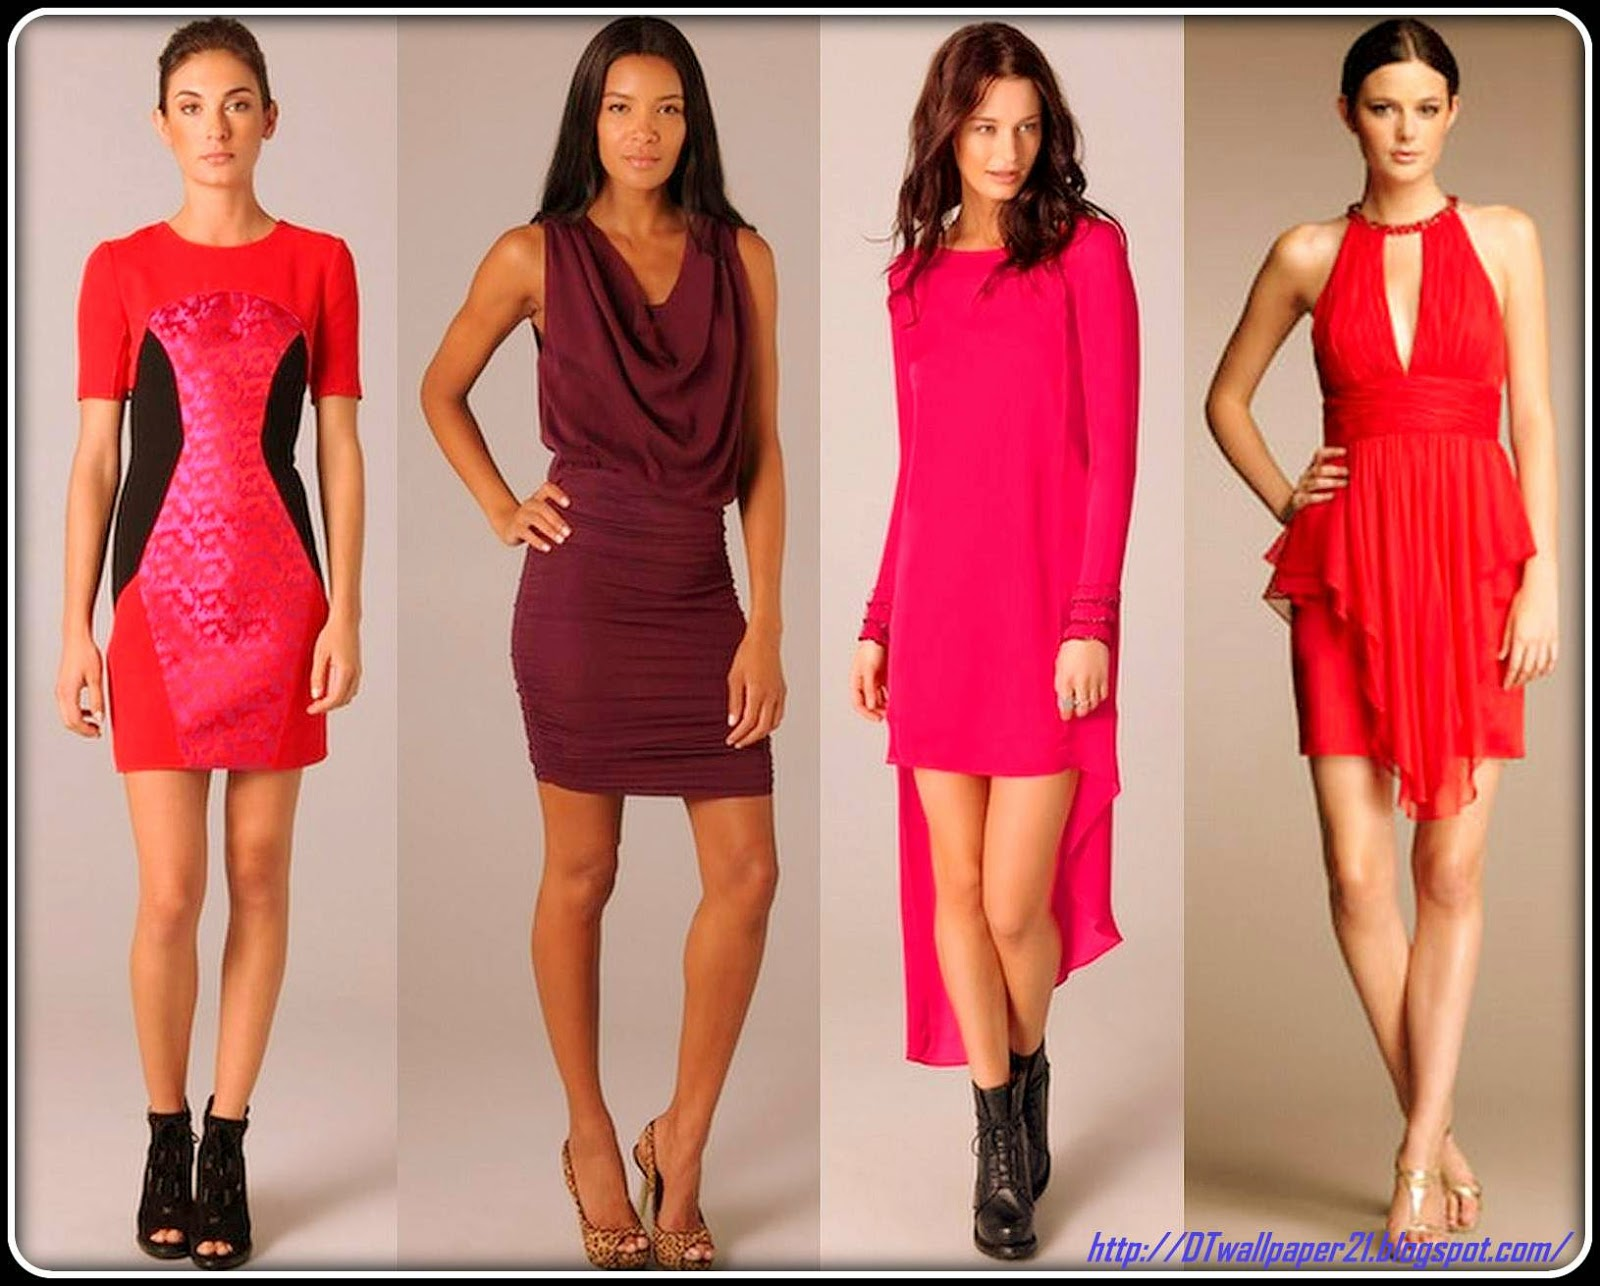 arts, fashion, white dress, wedding dresses, dresses, clothes, fashion designer